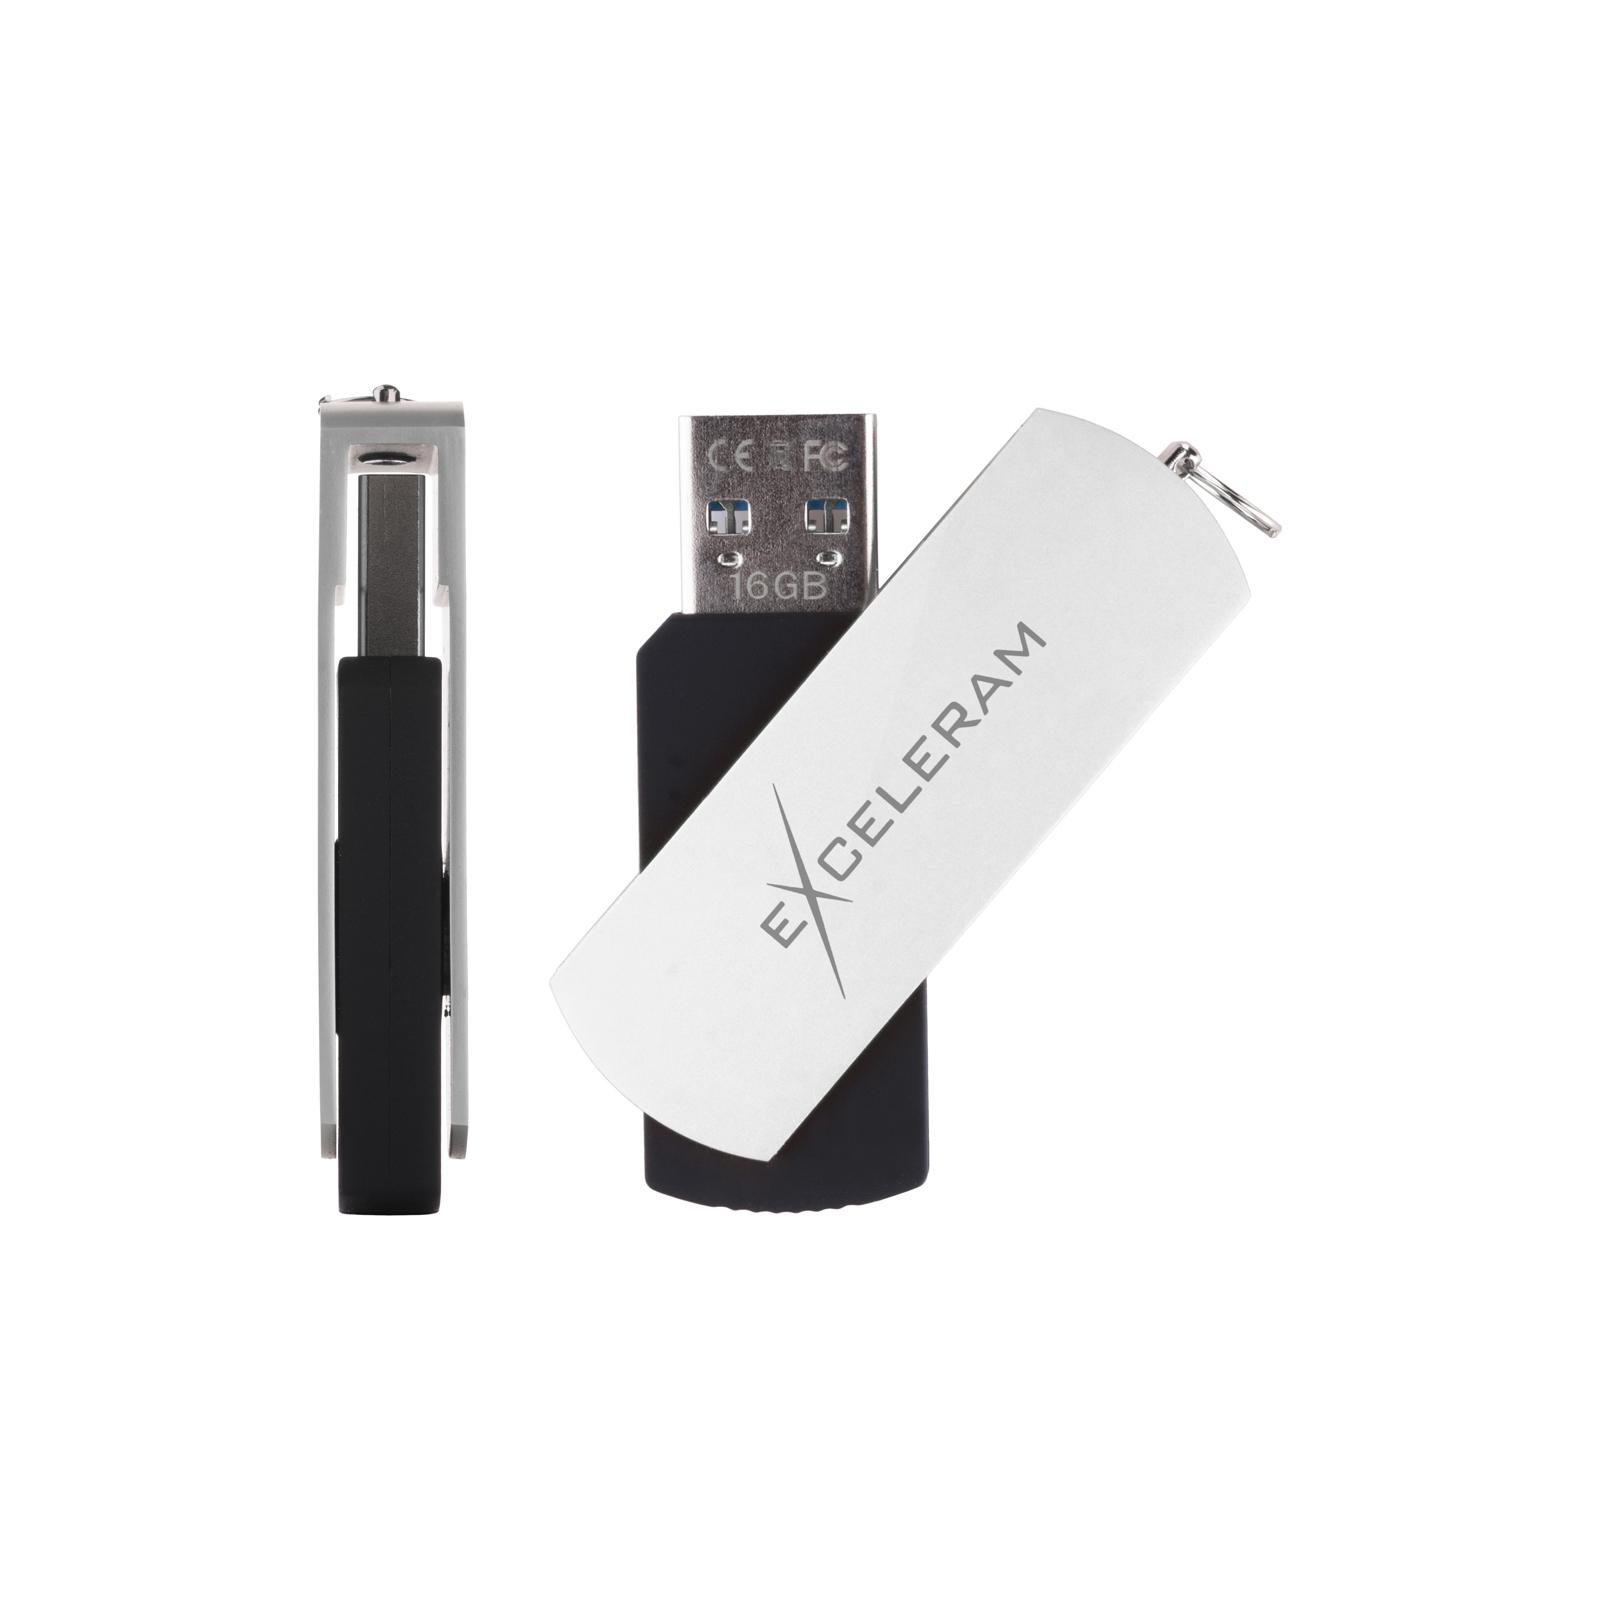 USB флеш накопитель eXceleram 64GB P2 Series Yellow2/Black USB 2.0 (EXP2U2Y2B64) изображение 4